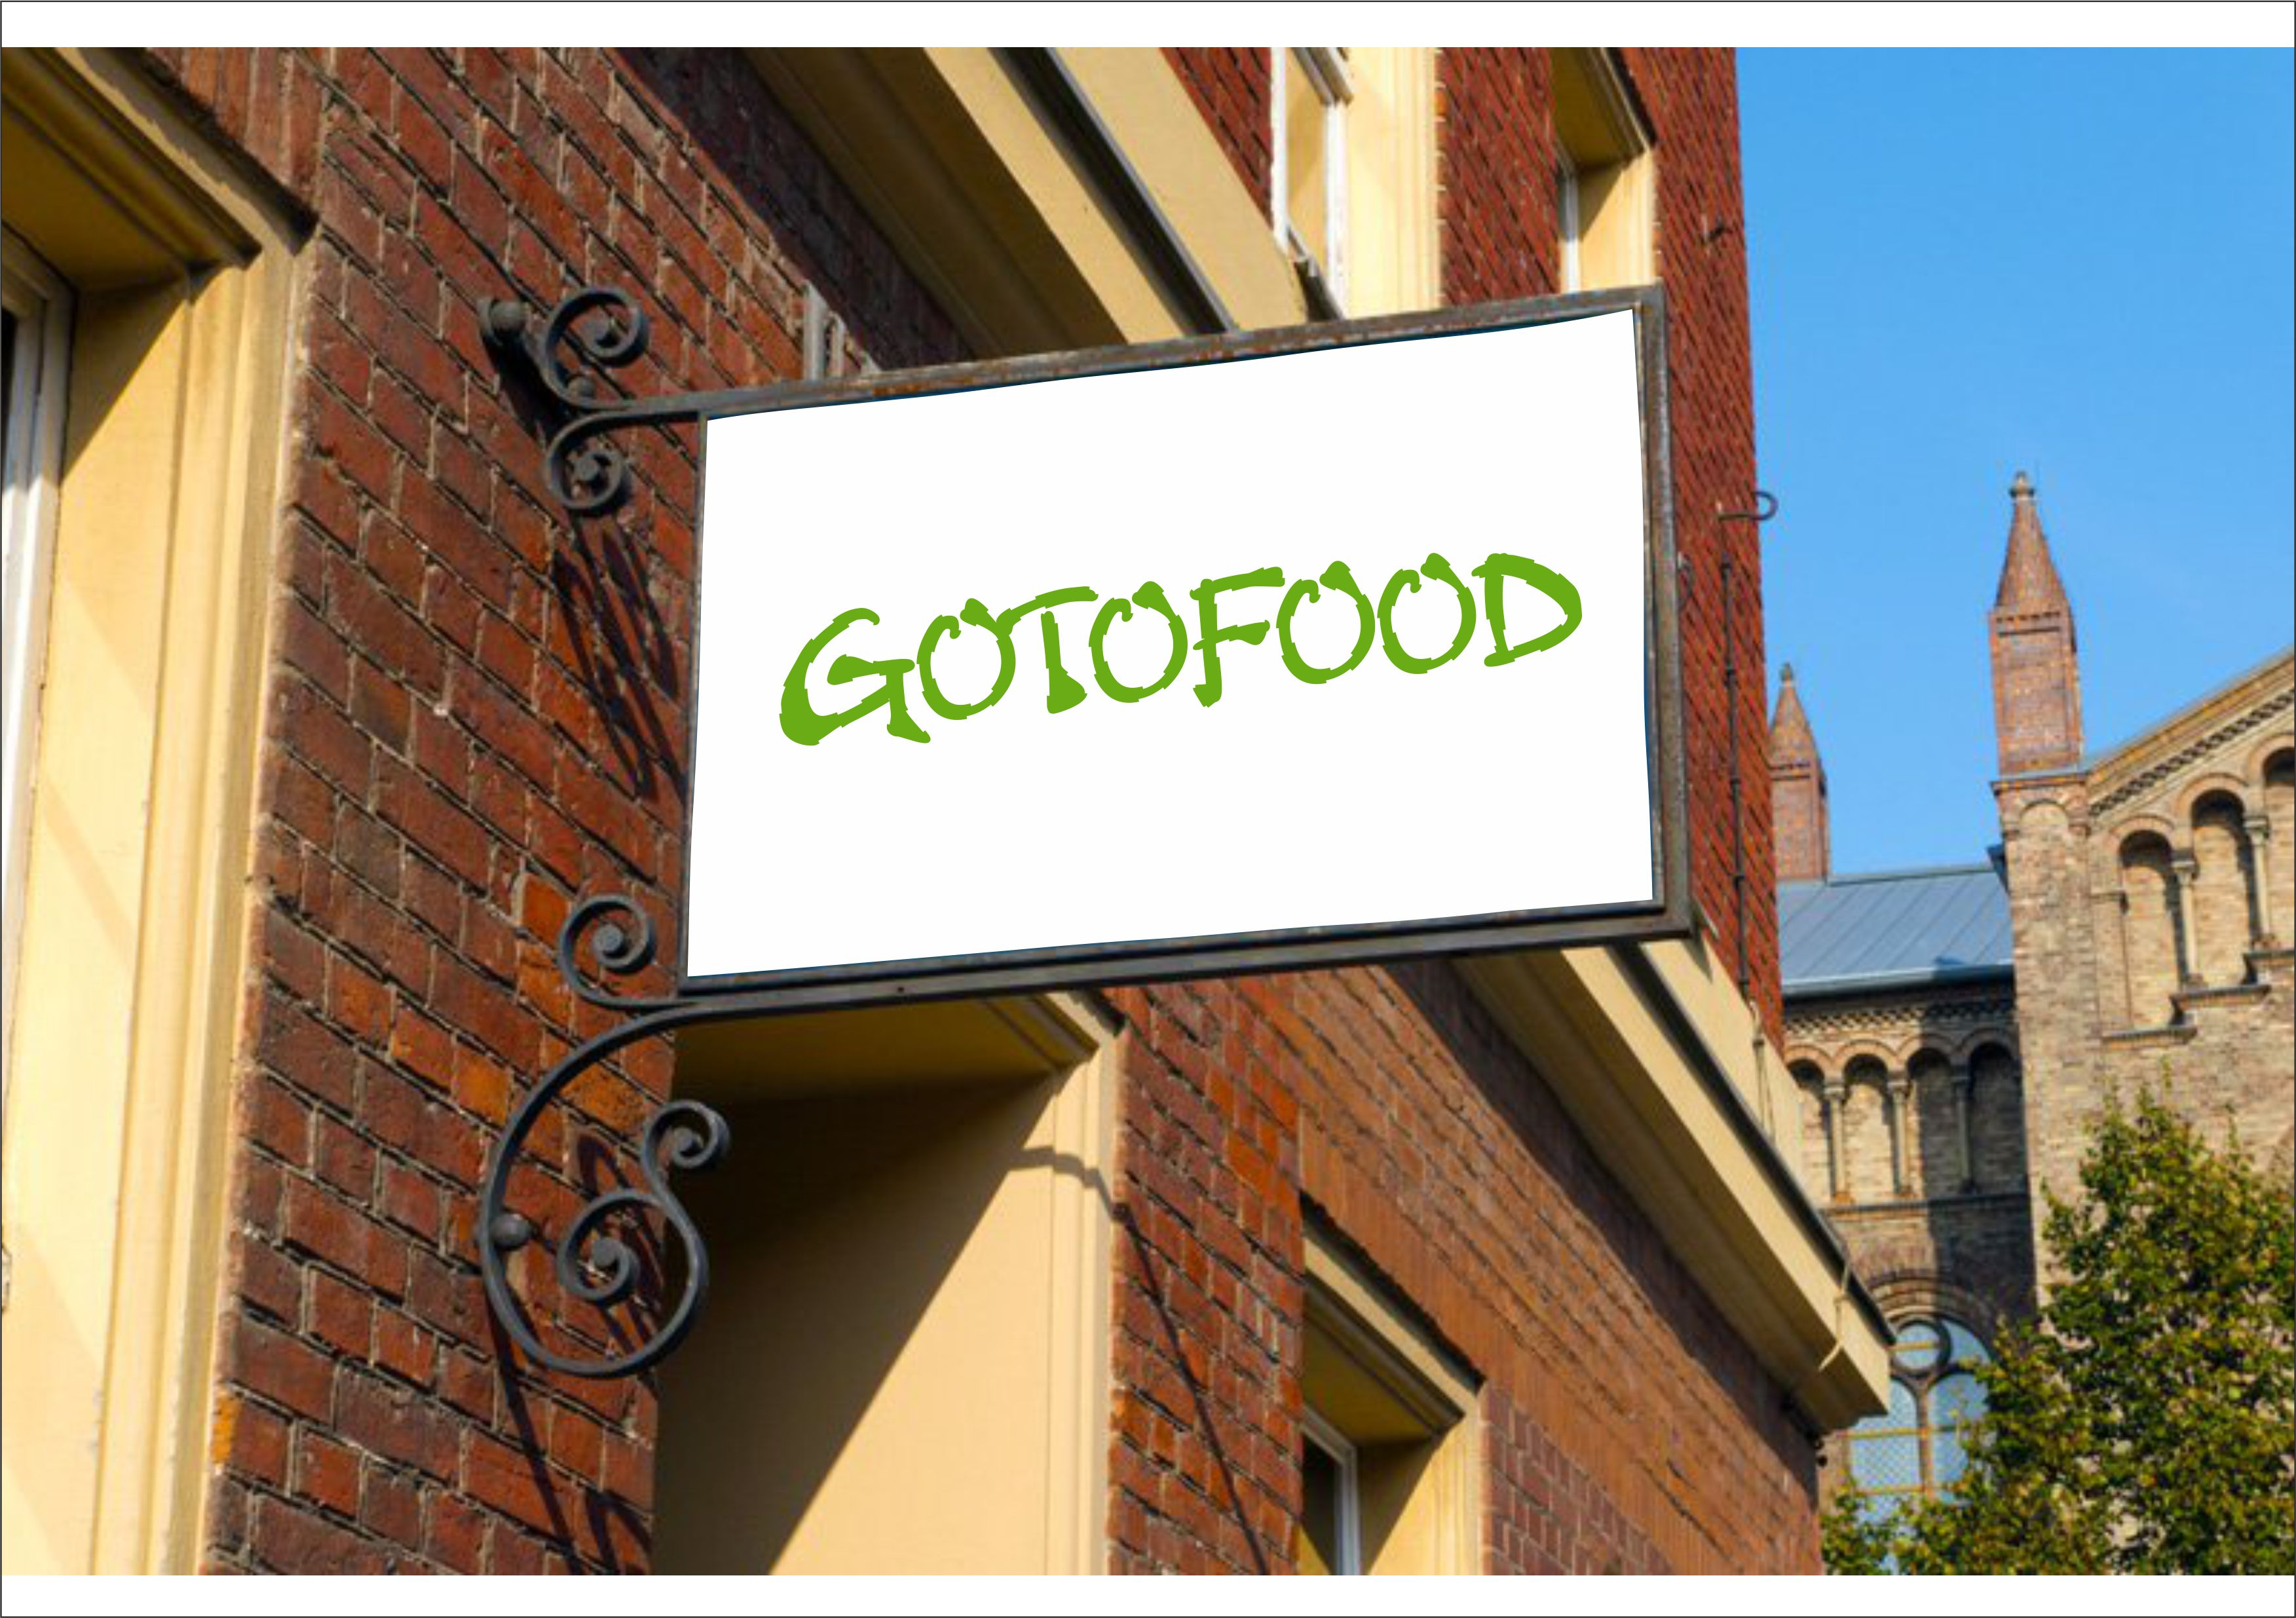 Логотип интернет-магазина здоровой еды фото f_4015cd3014b49cee.jpg